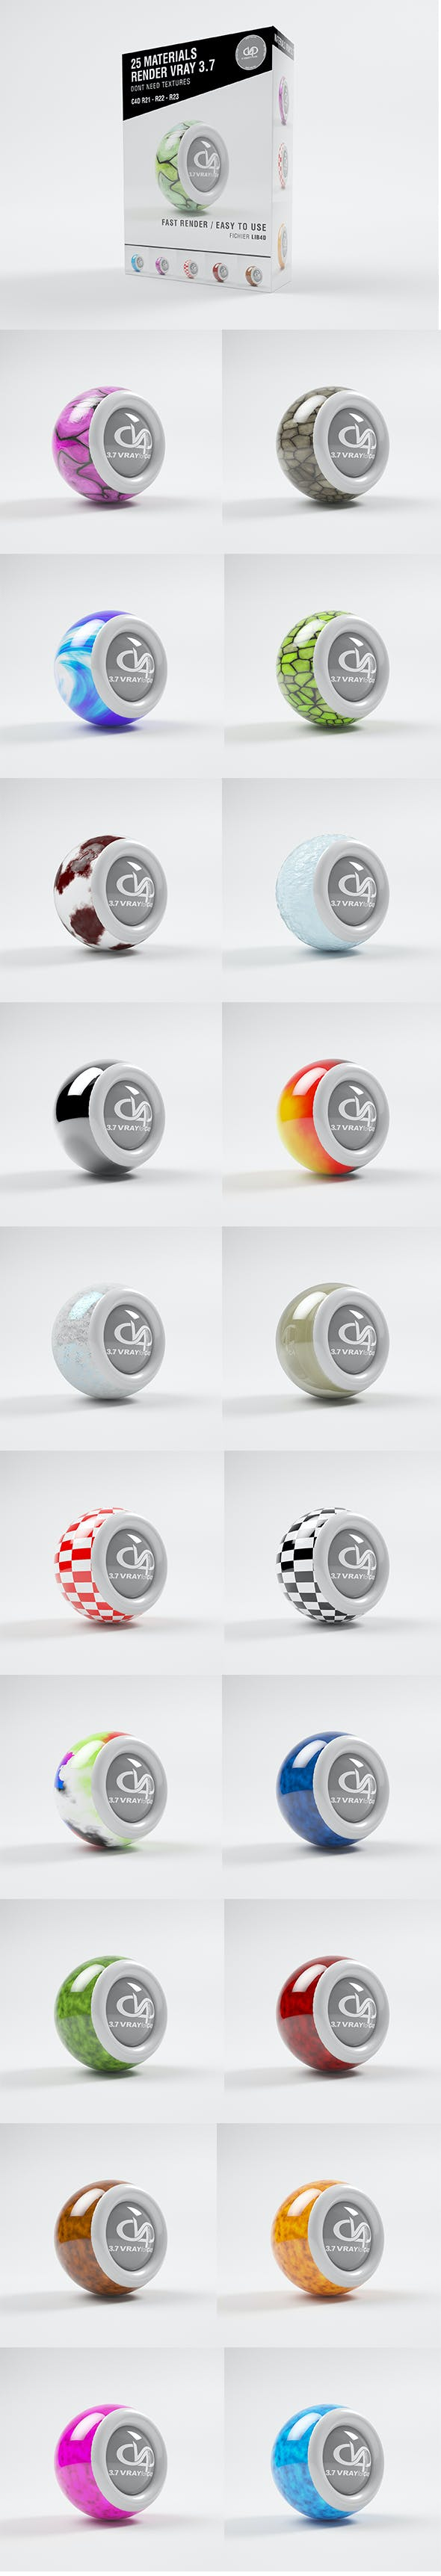 25 Materials CRAY 3.7 C4D - R20 / R21 / R22 / R23 - 3DOcean Item for Sale